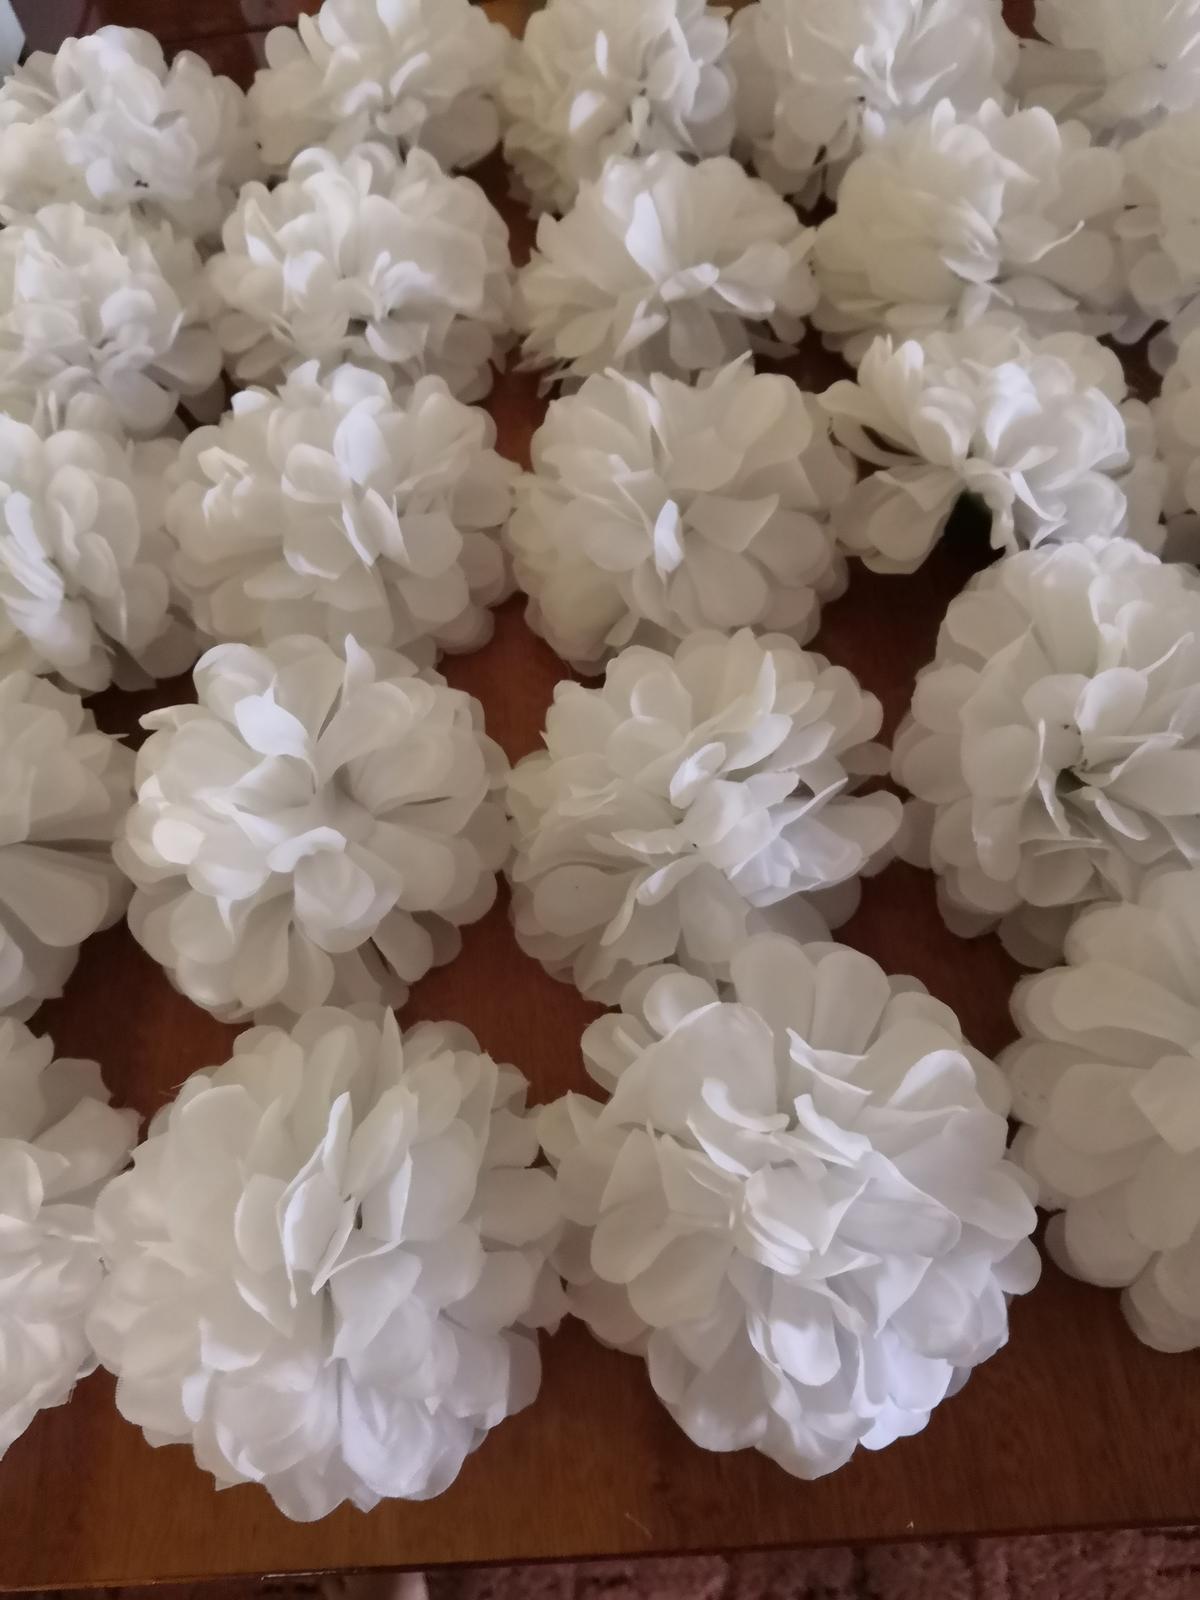 Kvet biely (chryzamtéma) - Obrázok č. 2